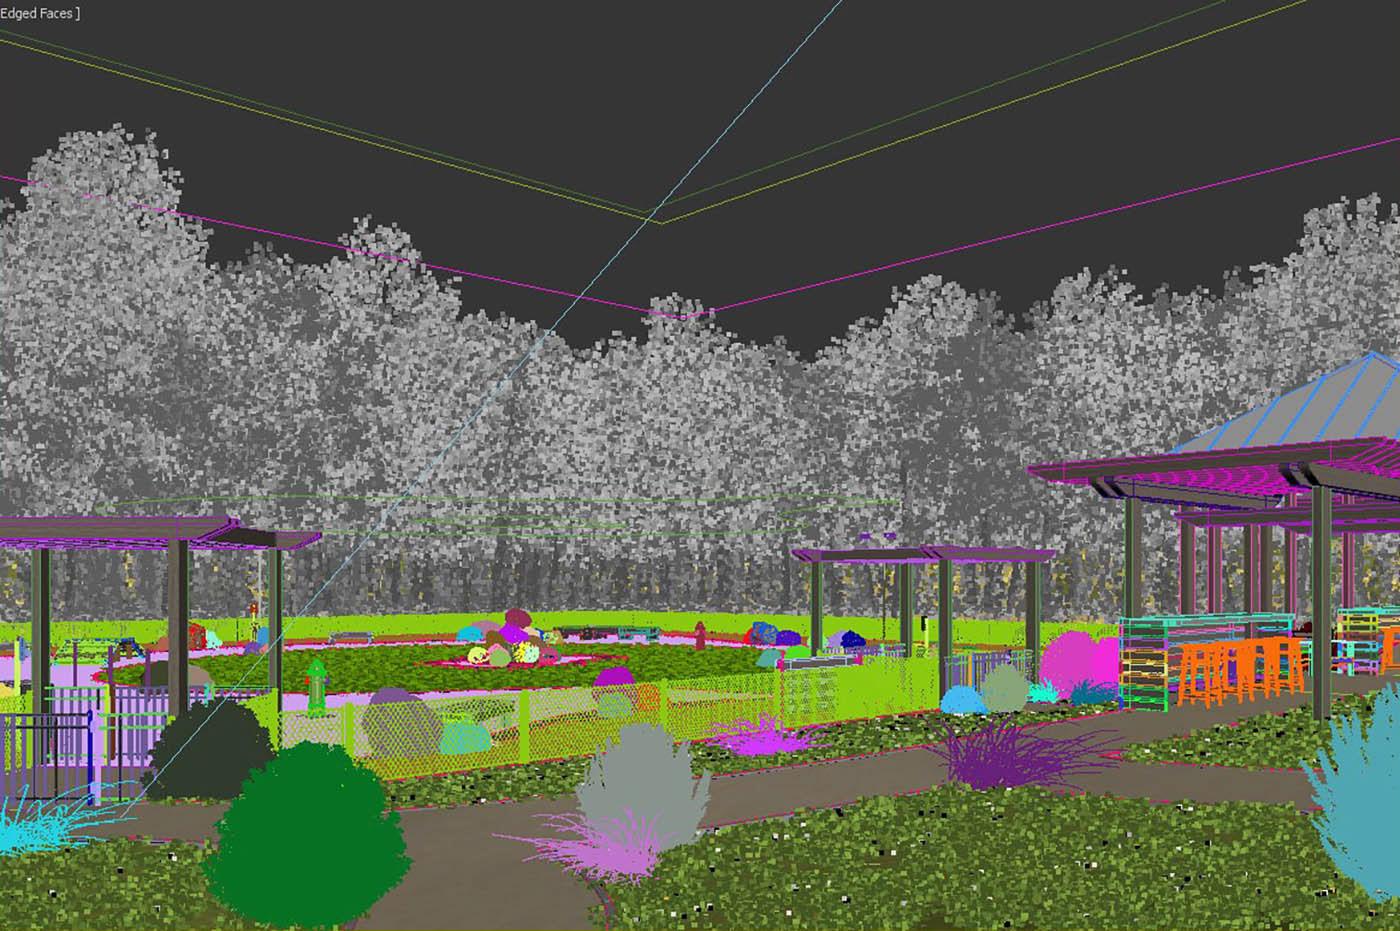 Image may contain: grass, tree and screenshot